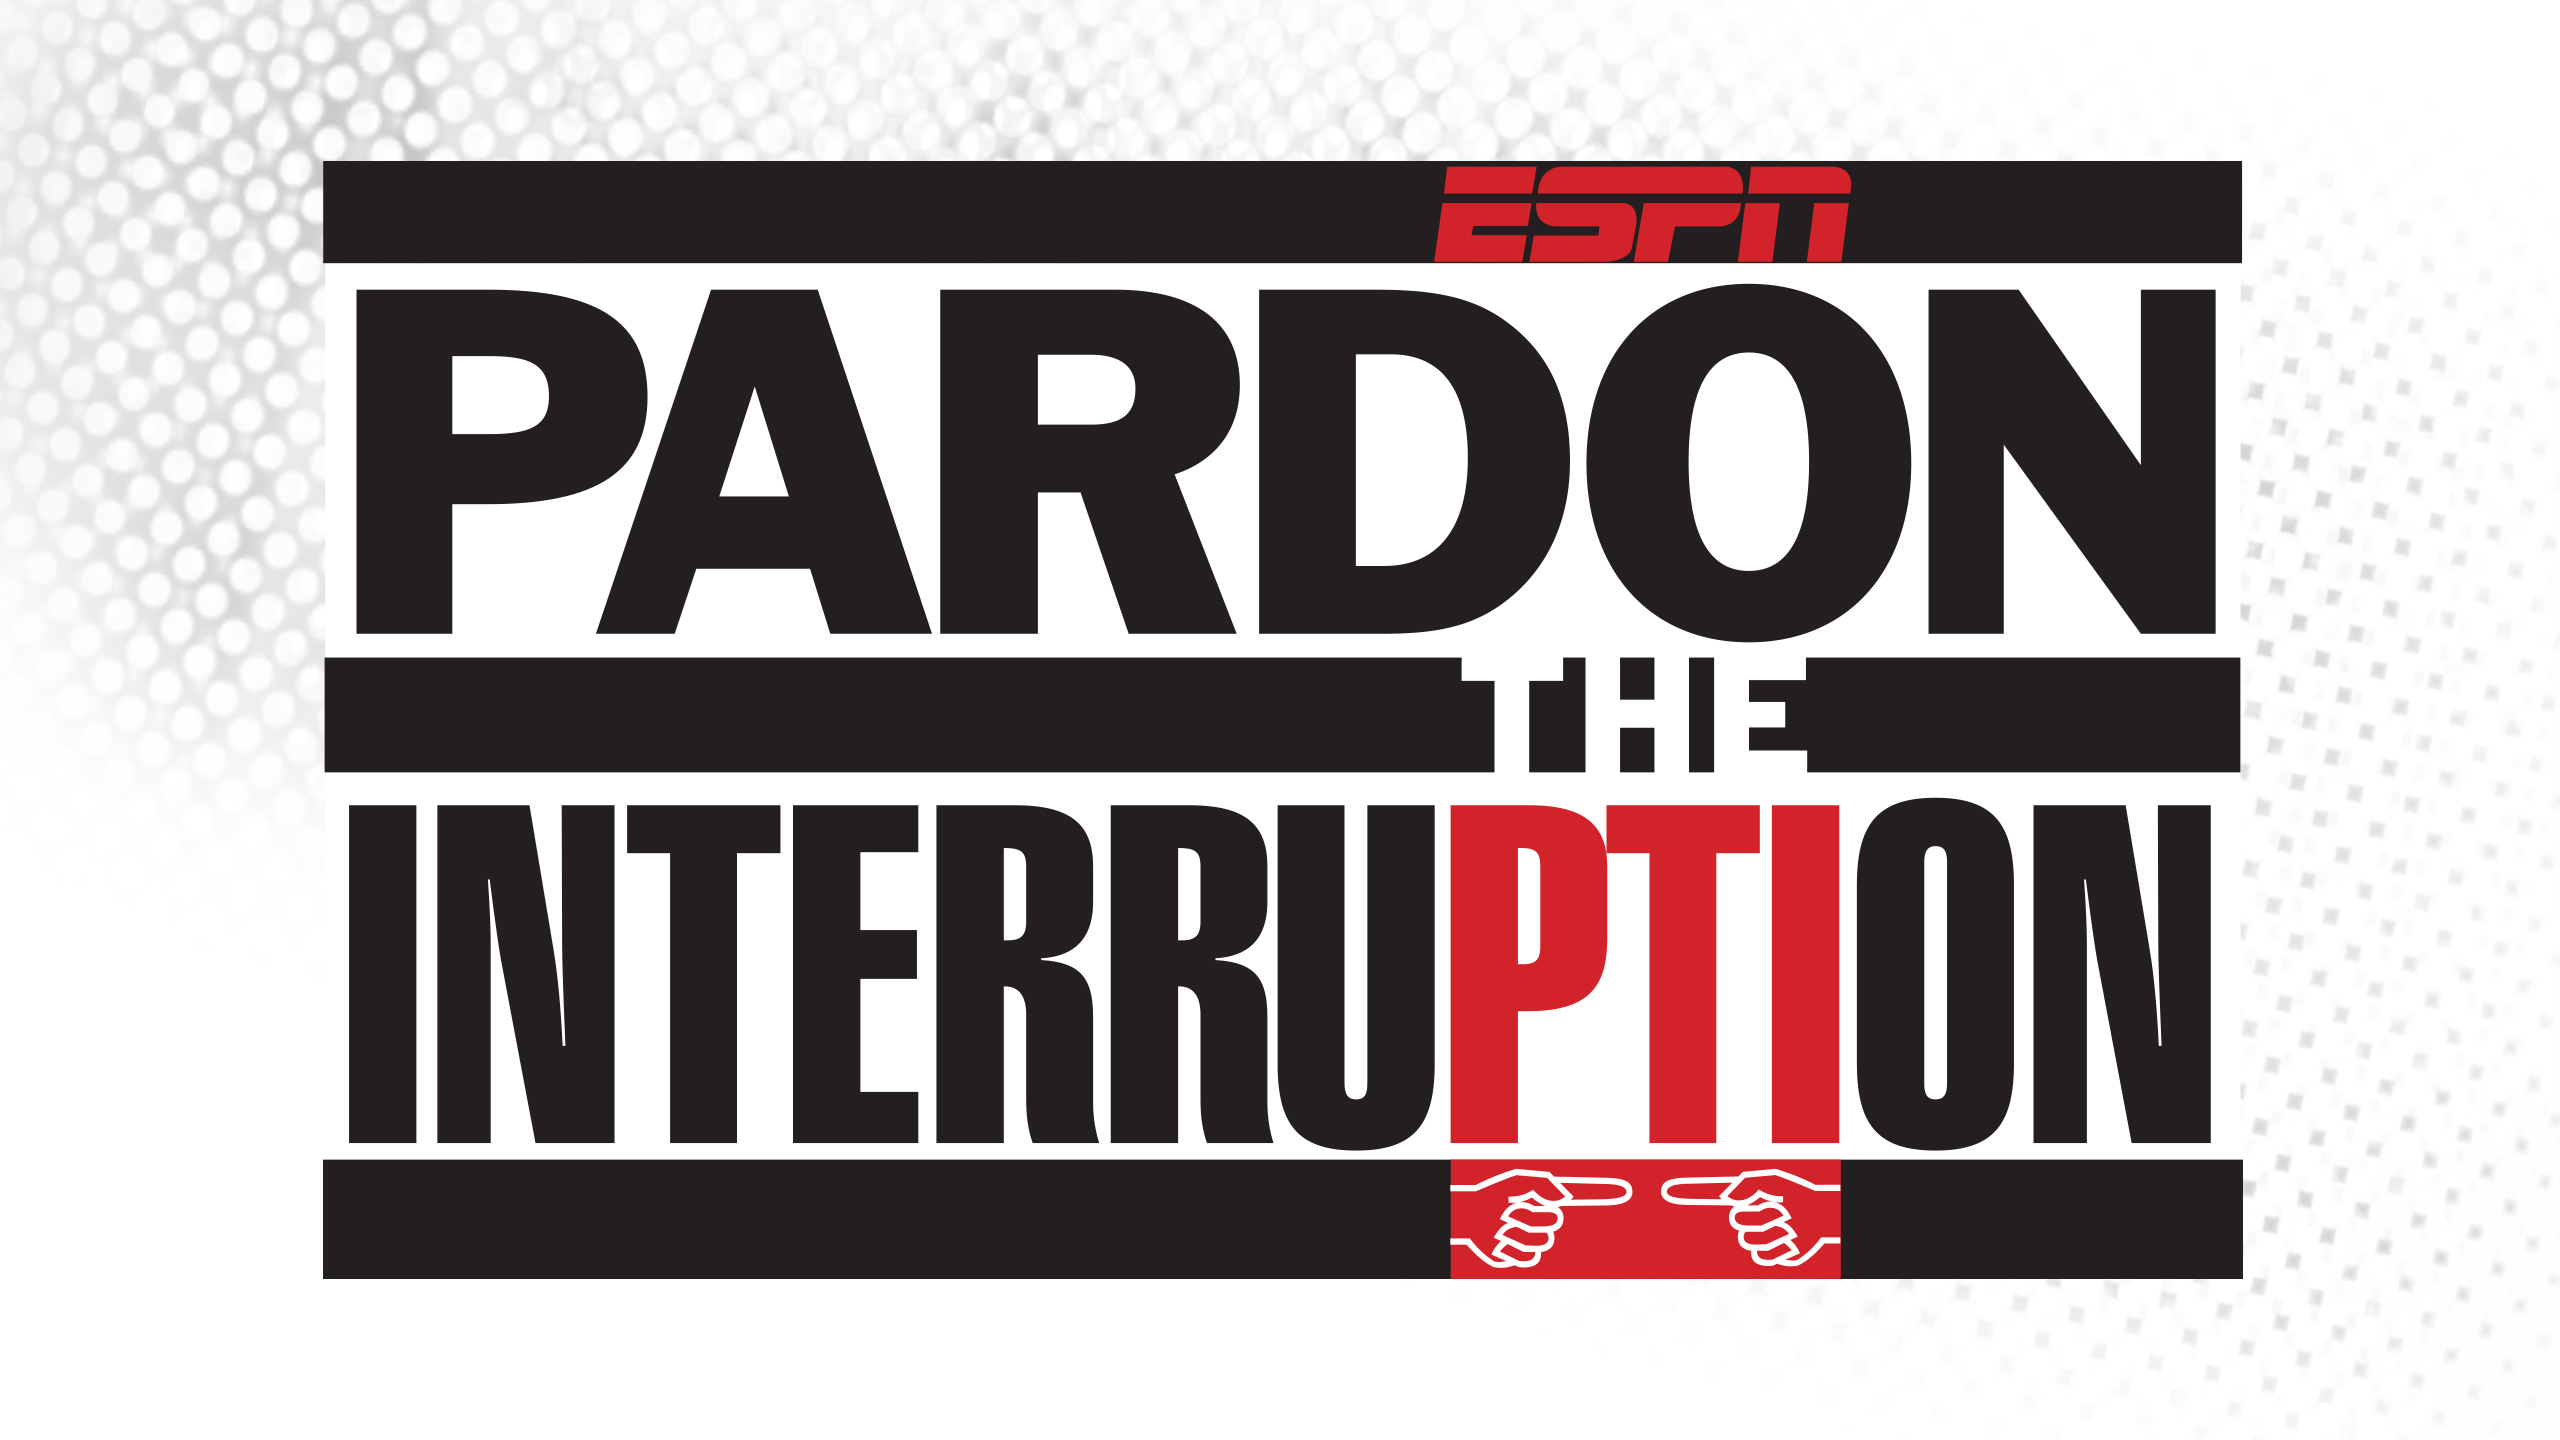 Thu, 12/6 - Pardon The Interruption